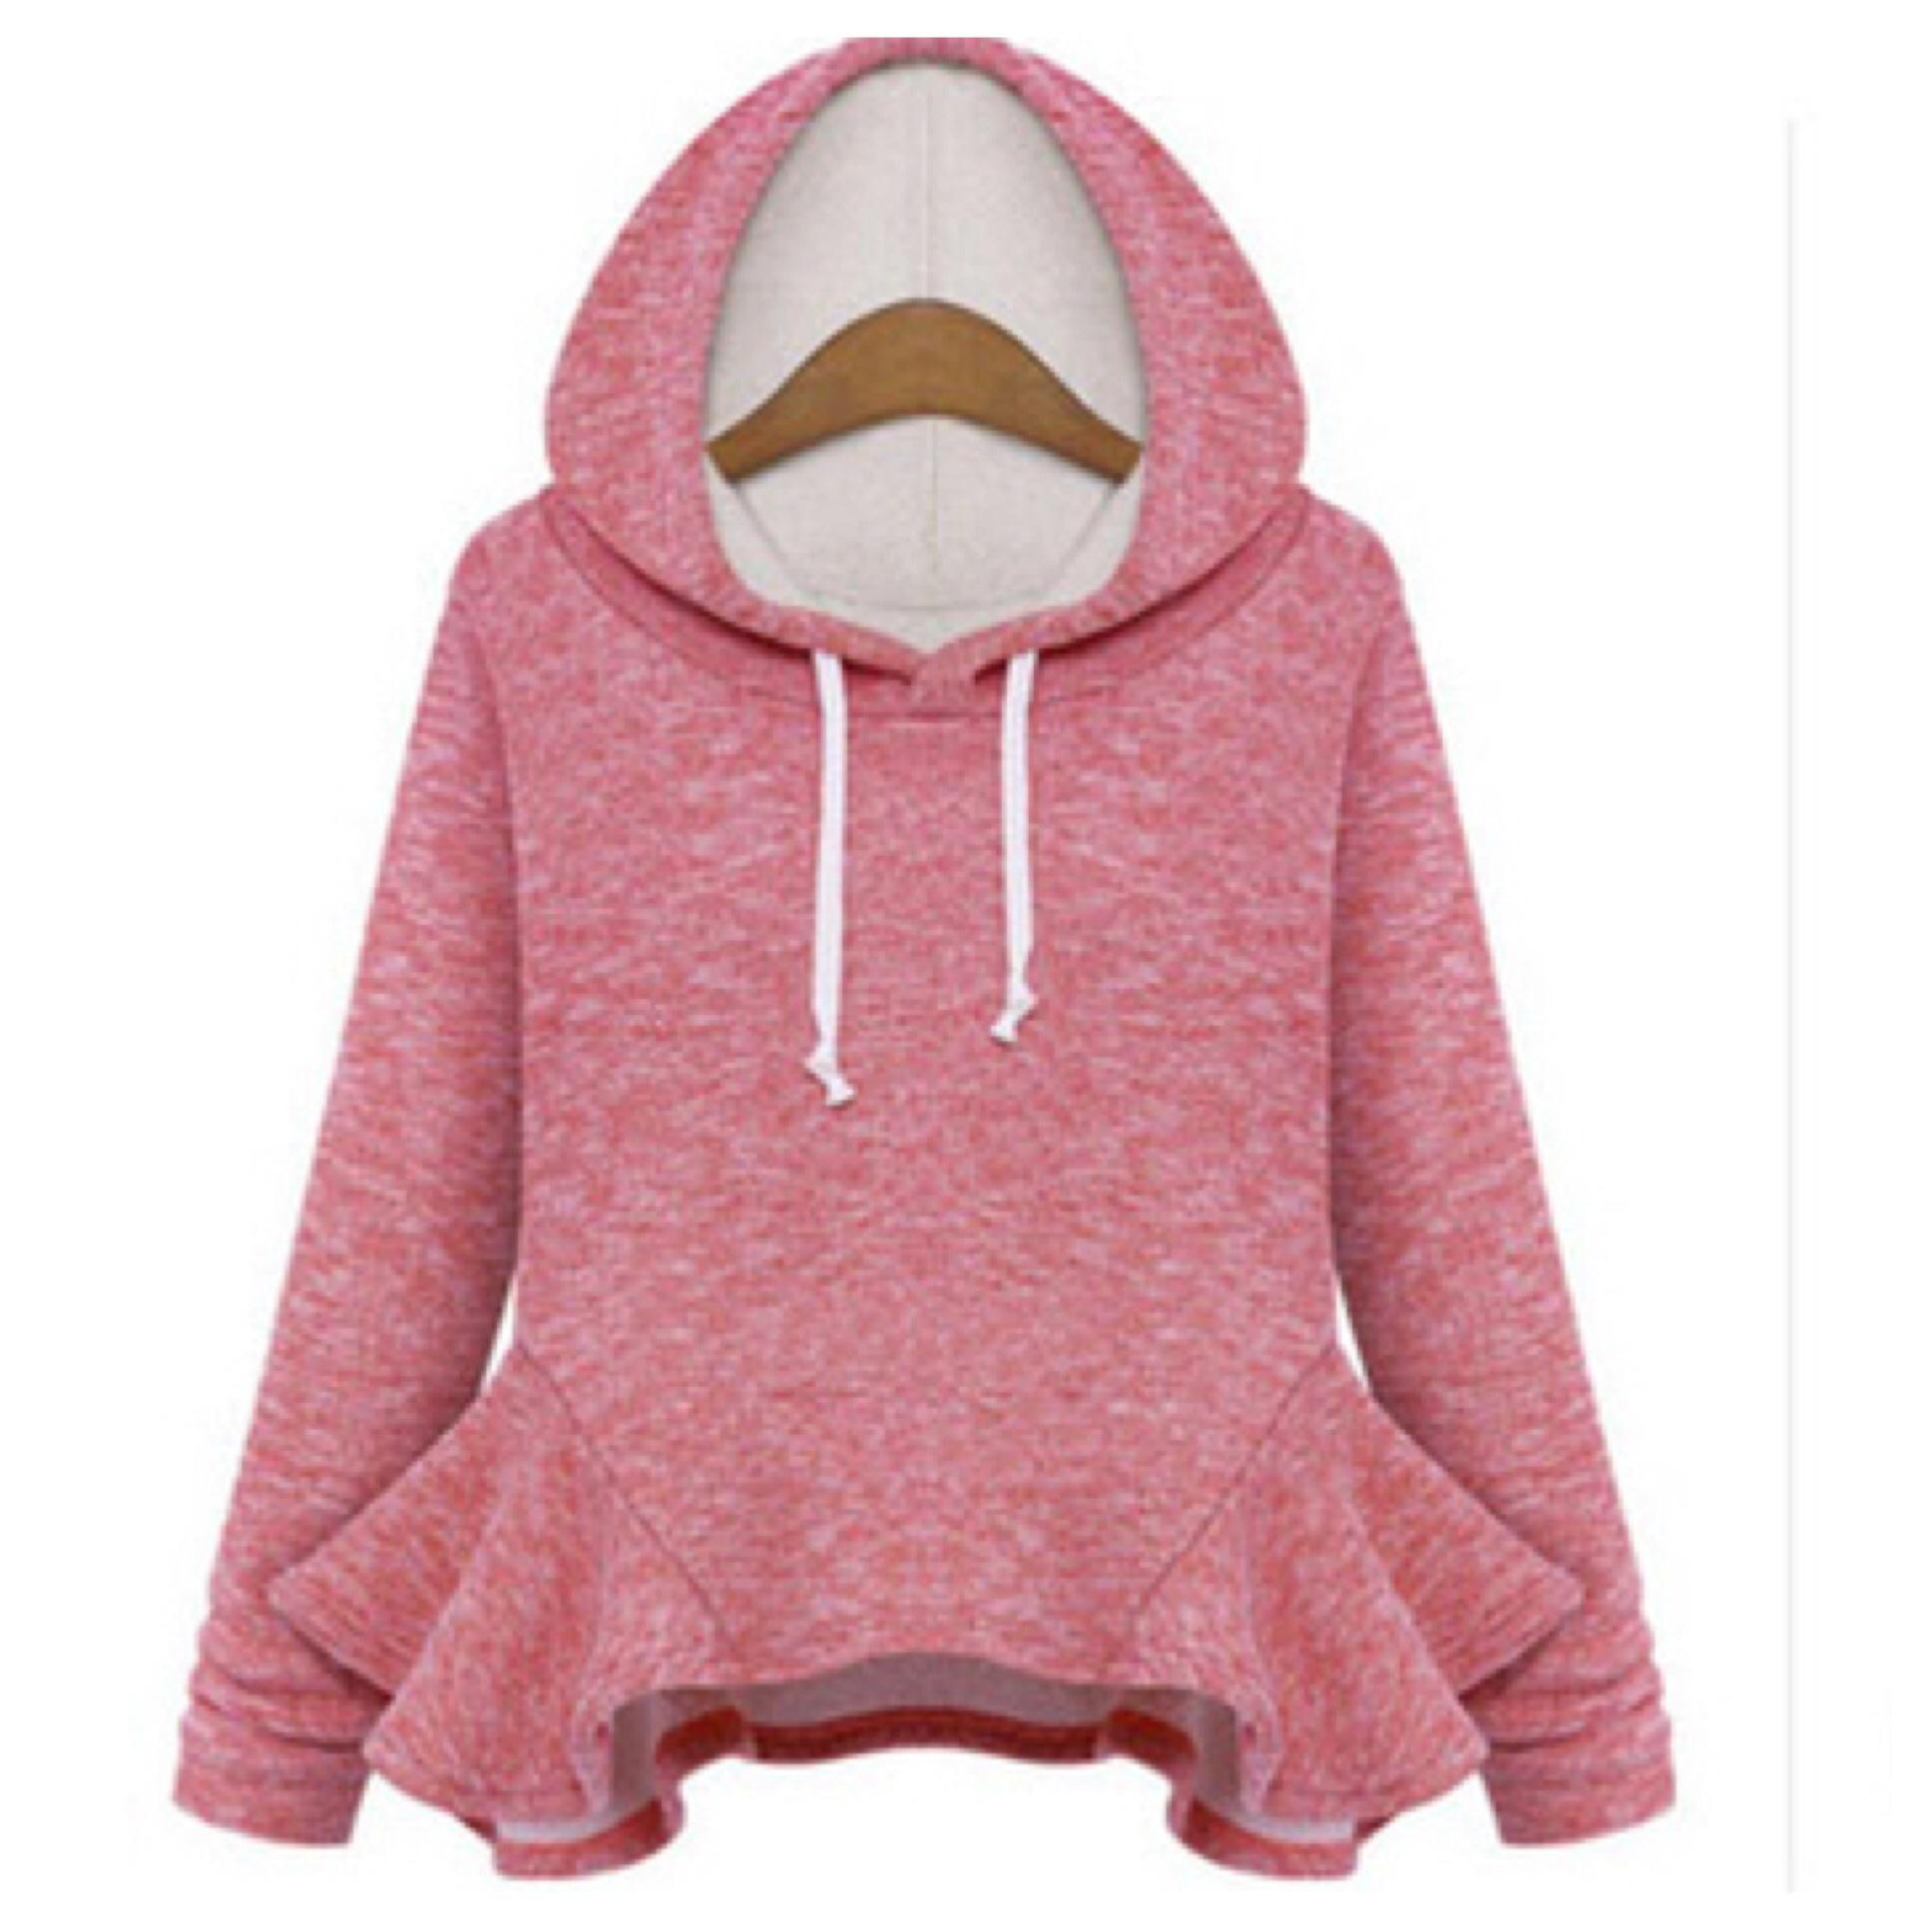 Trendy peplum hoodie from DoubleLW on Storenvy